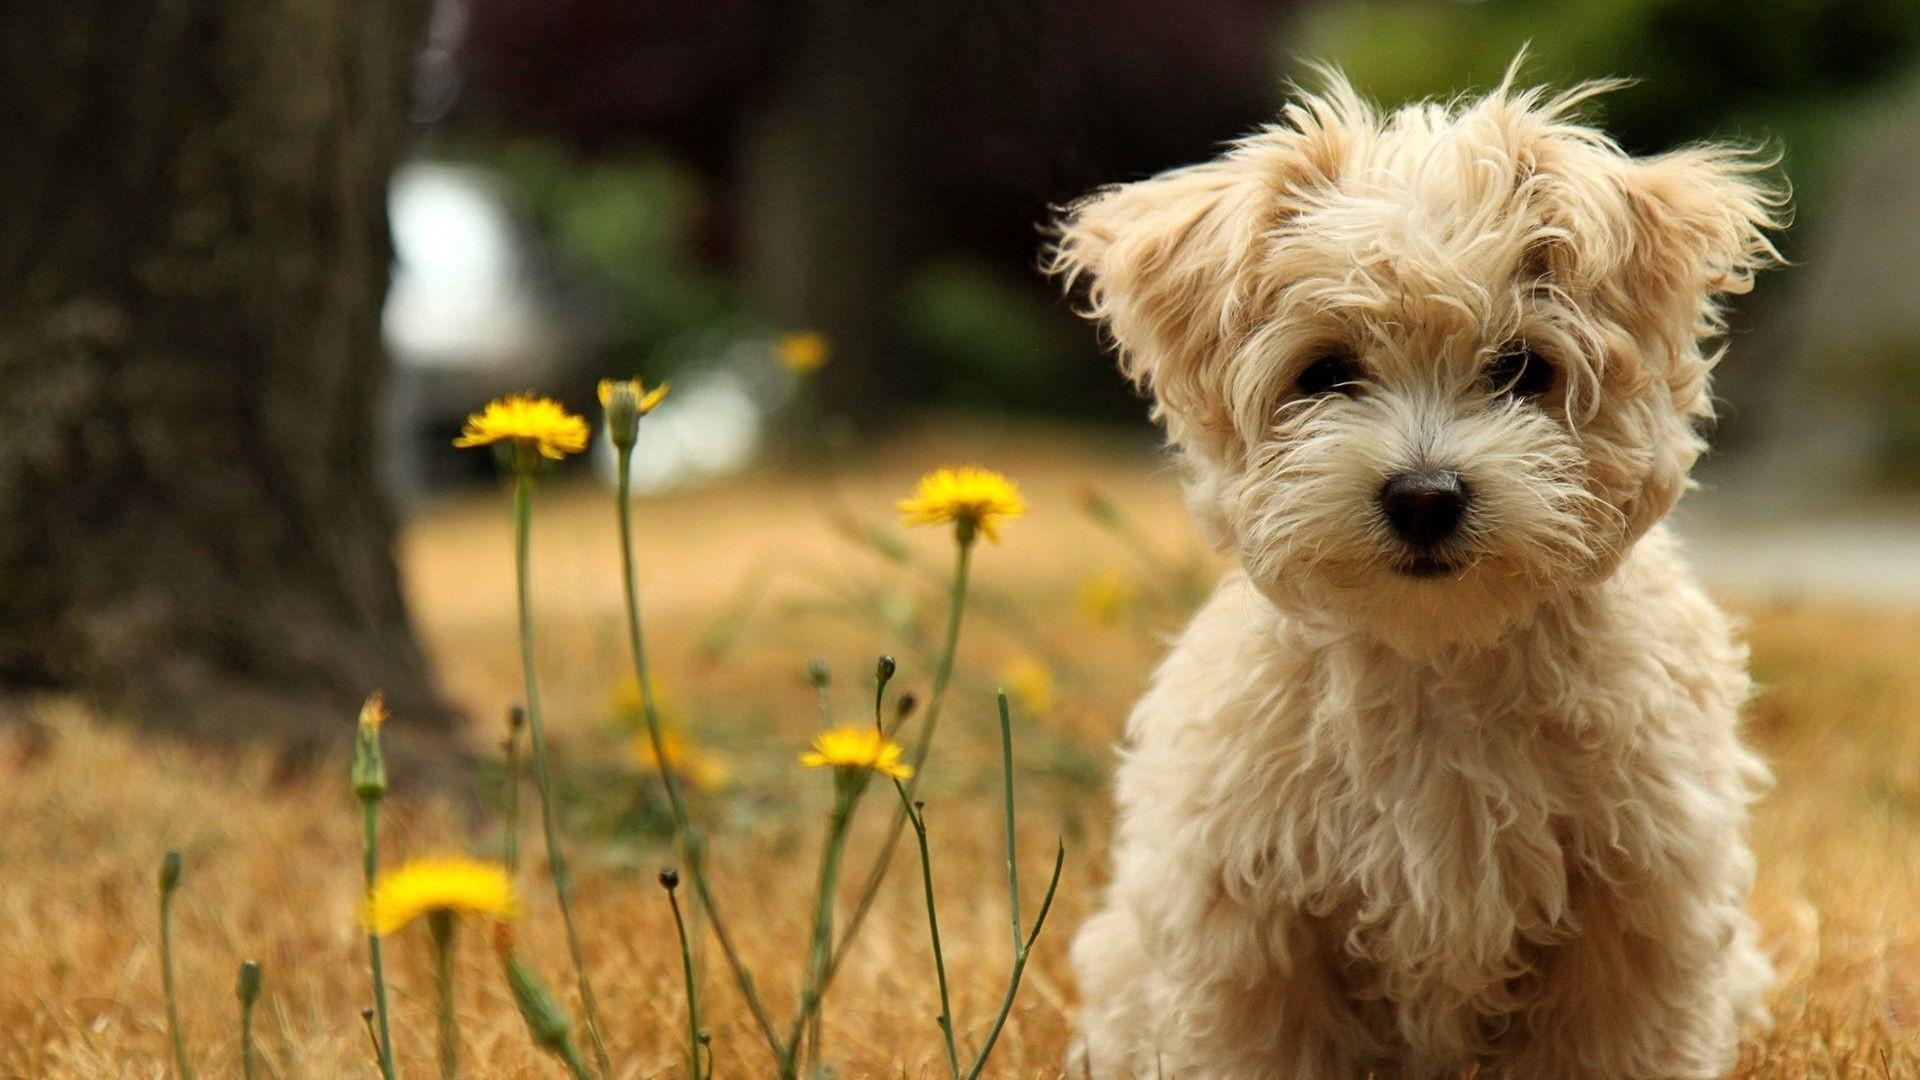 Cute Animal Background Wallpaper